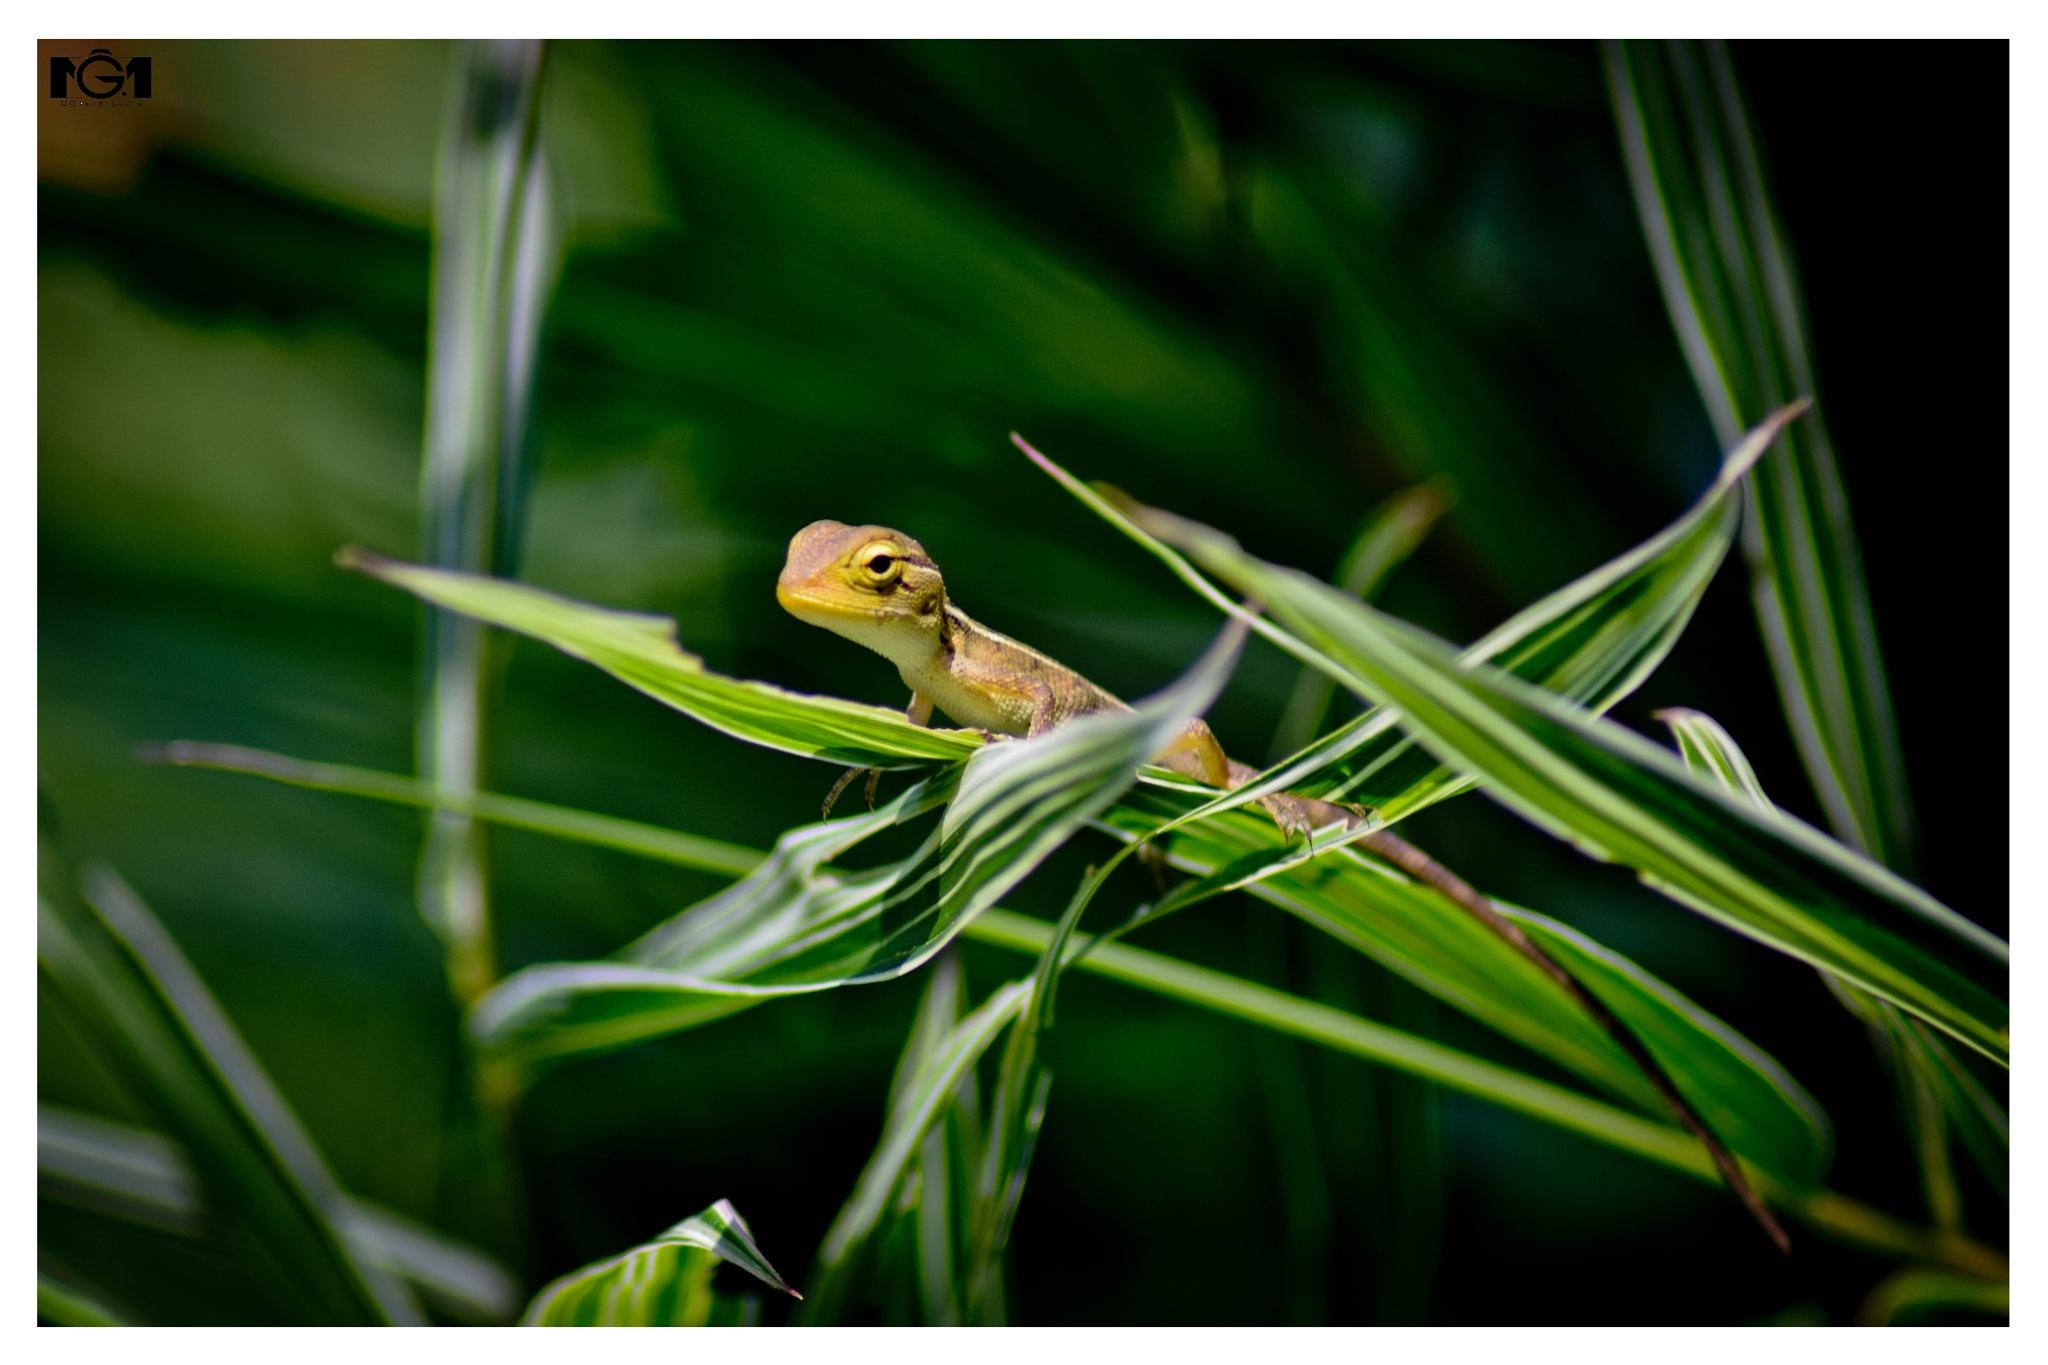 Wildlyf photography by Midhun Ganesh